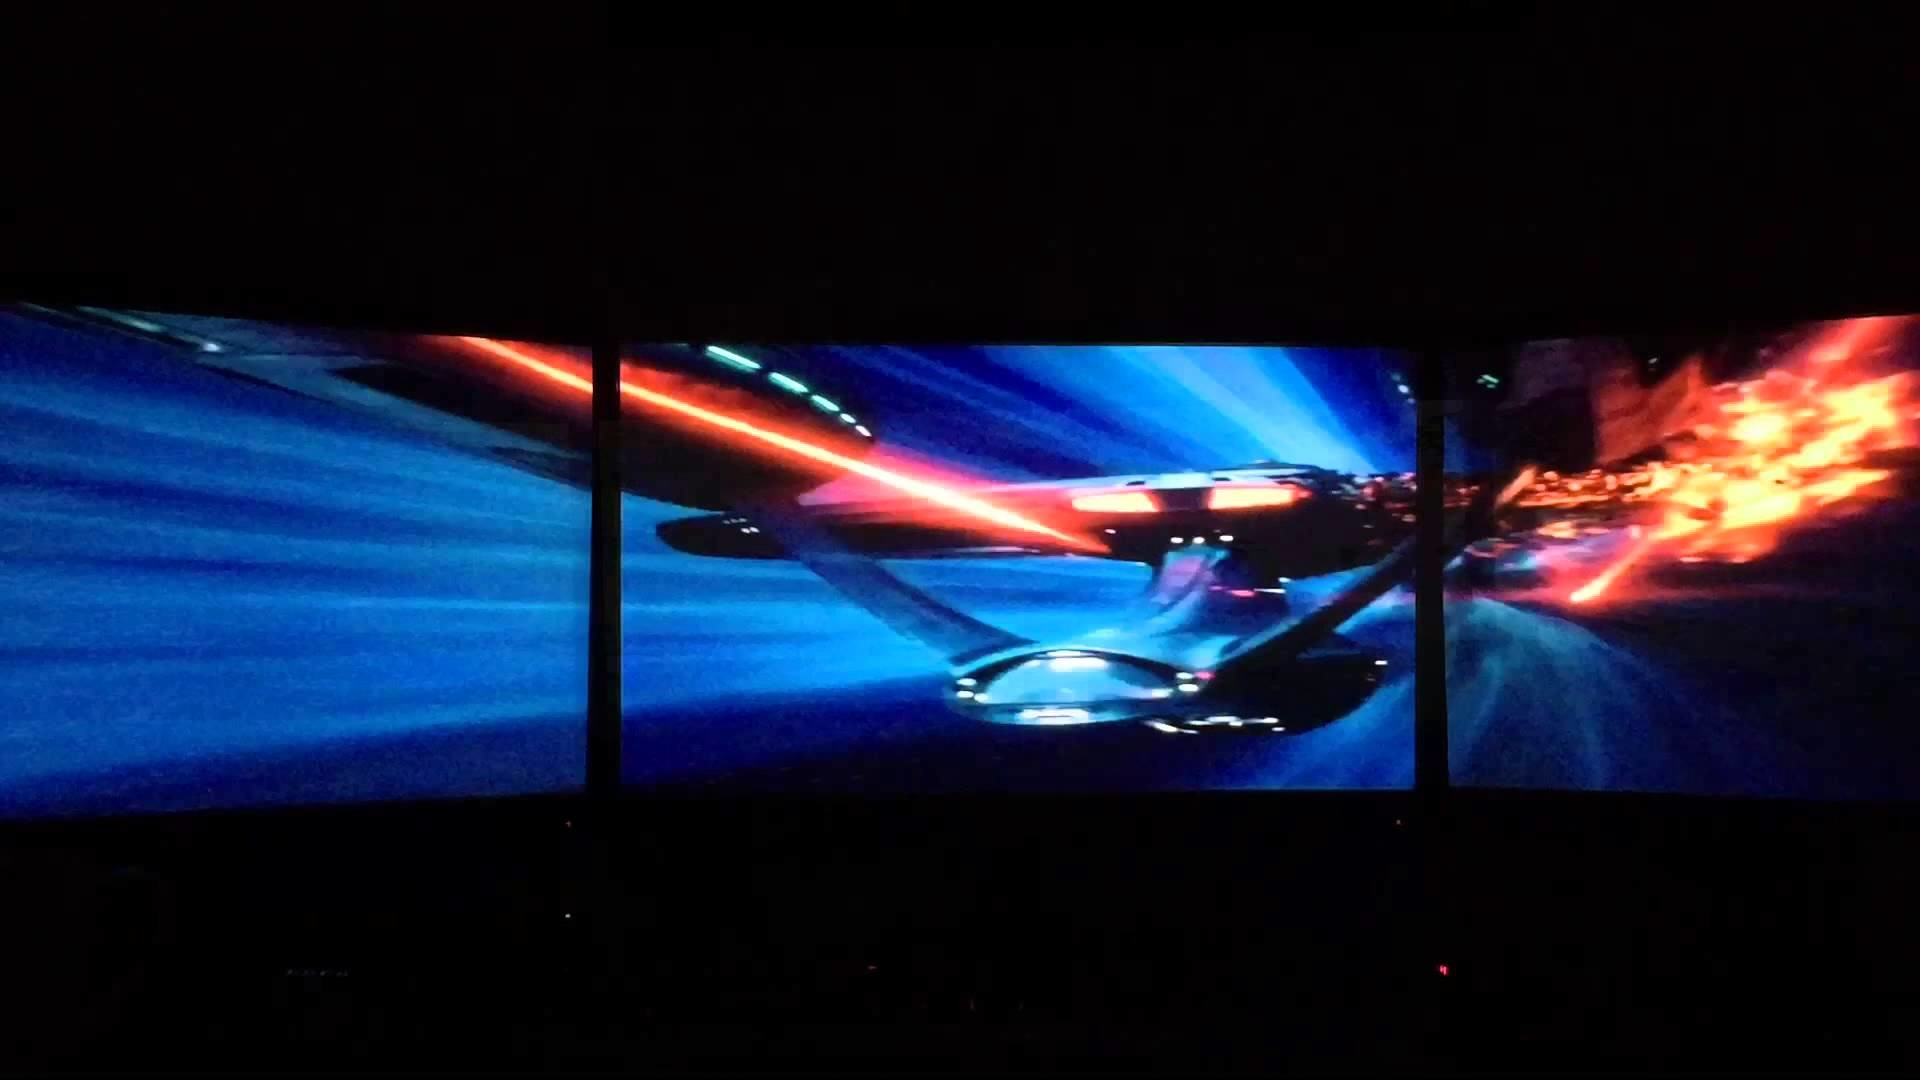 Triple Monitor Wallpaper Star Wars (25+ images)